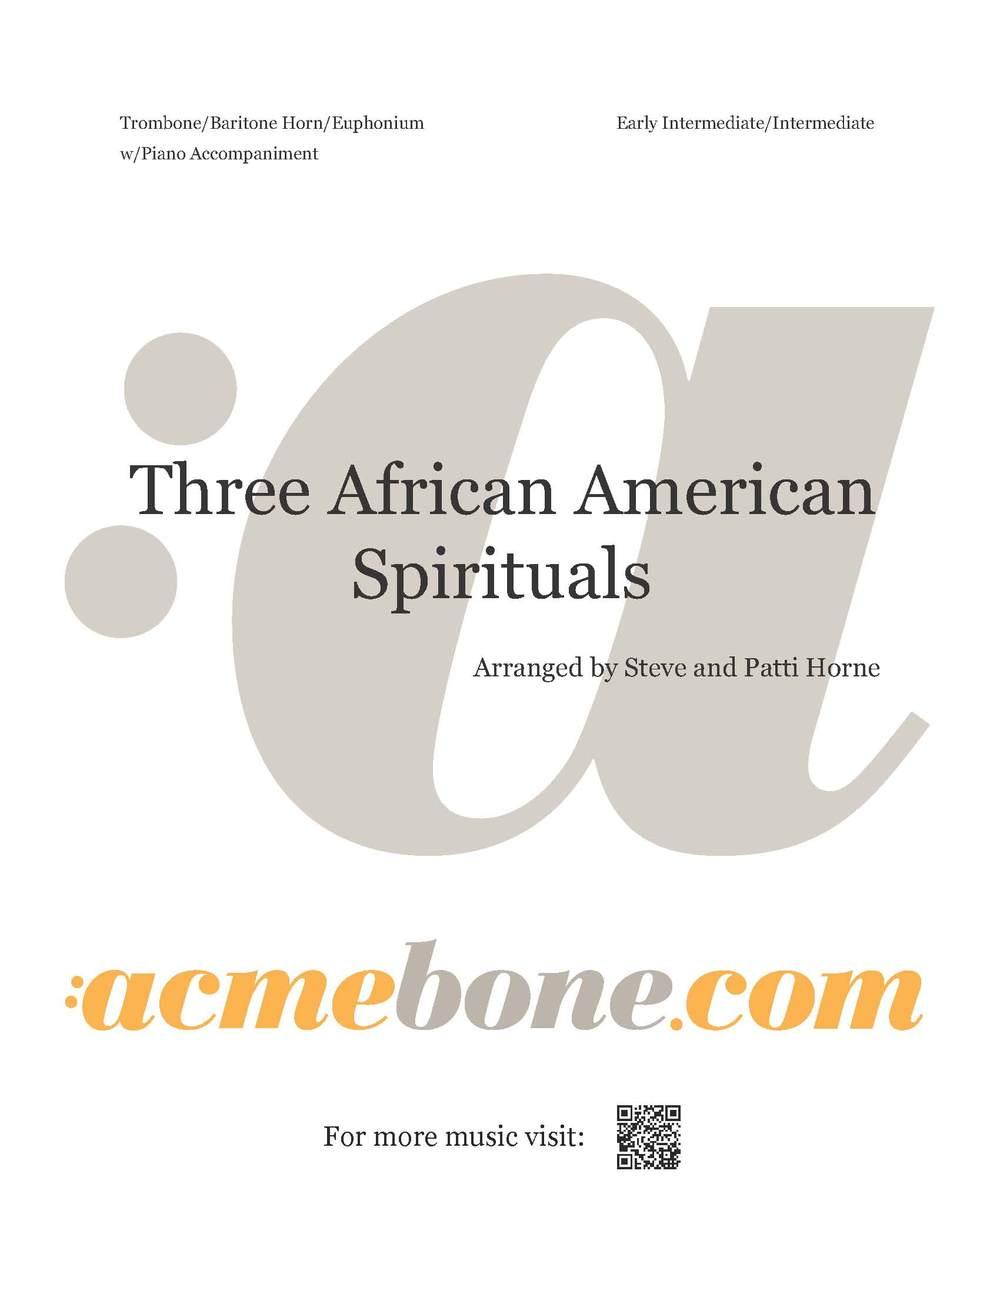 Three African American Spirituals_digital_cover.jpg